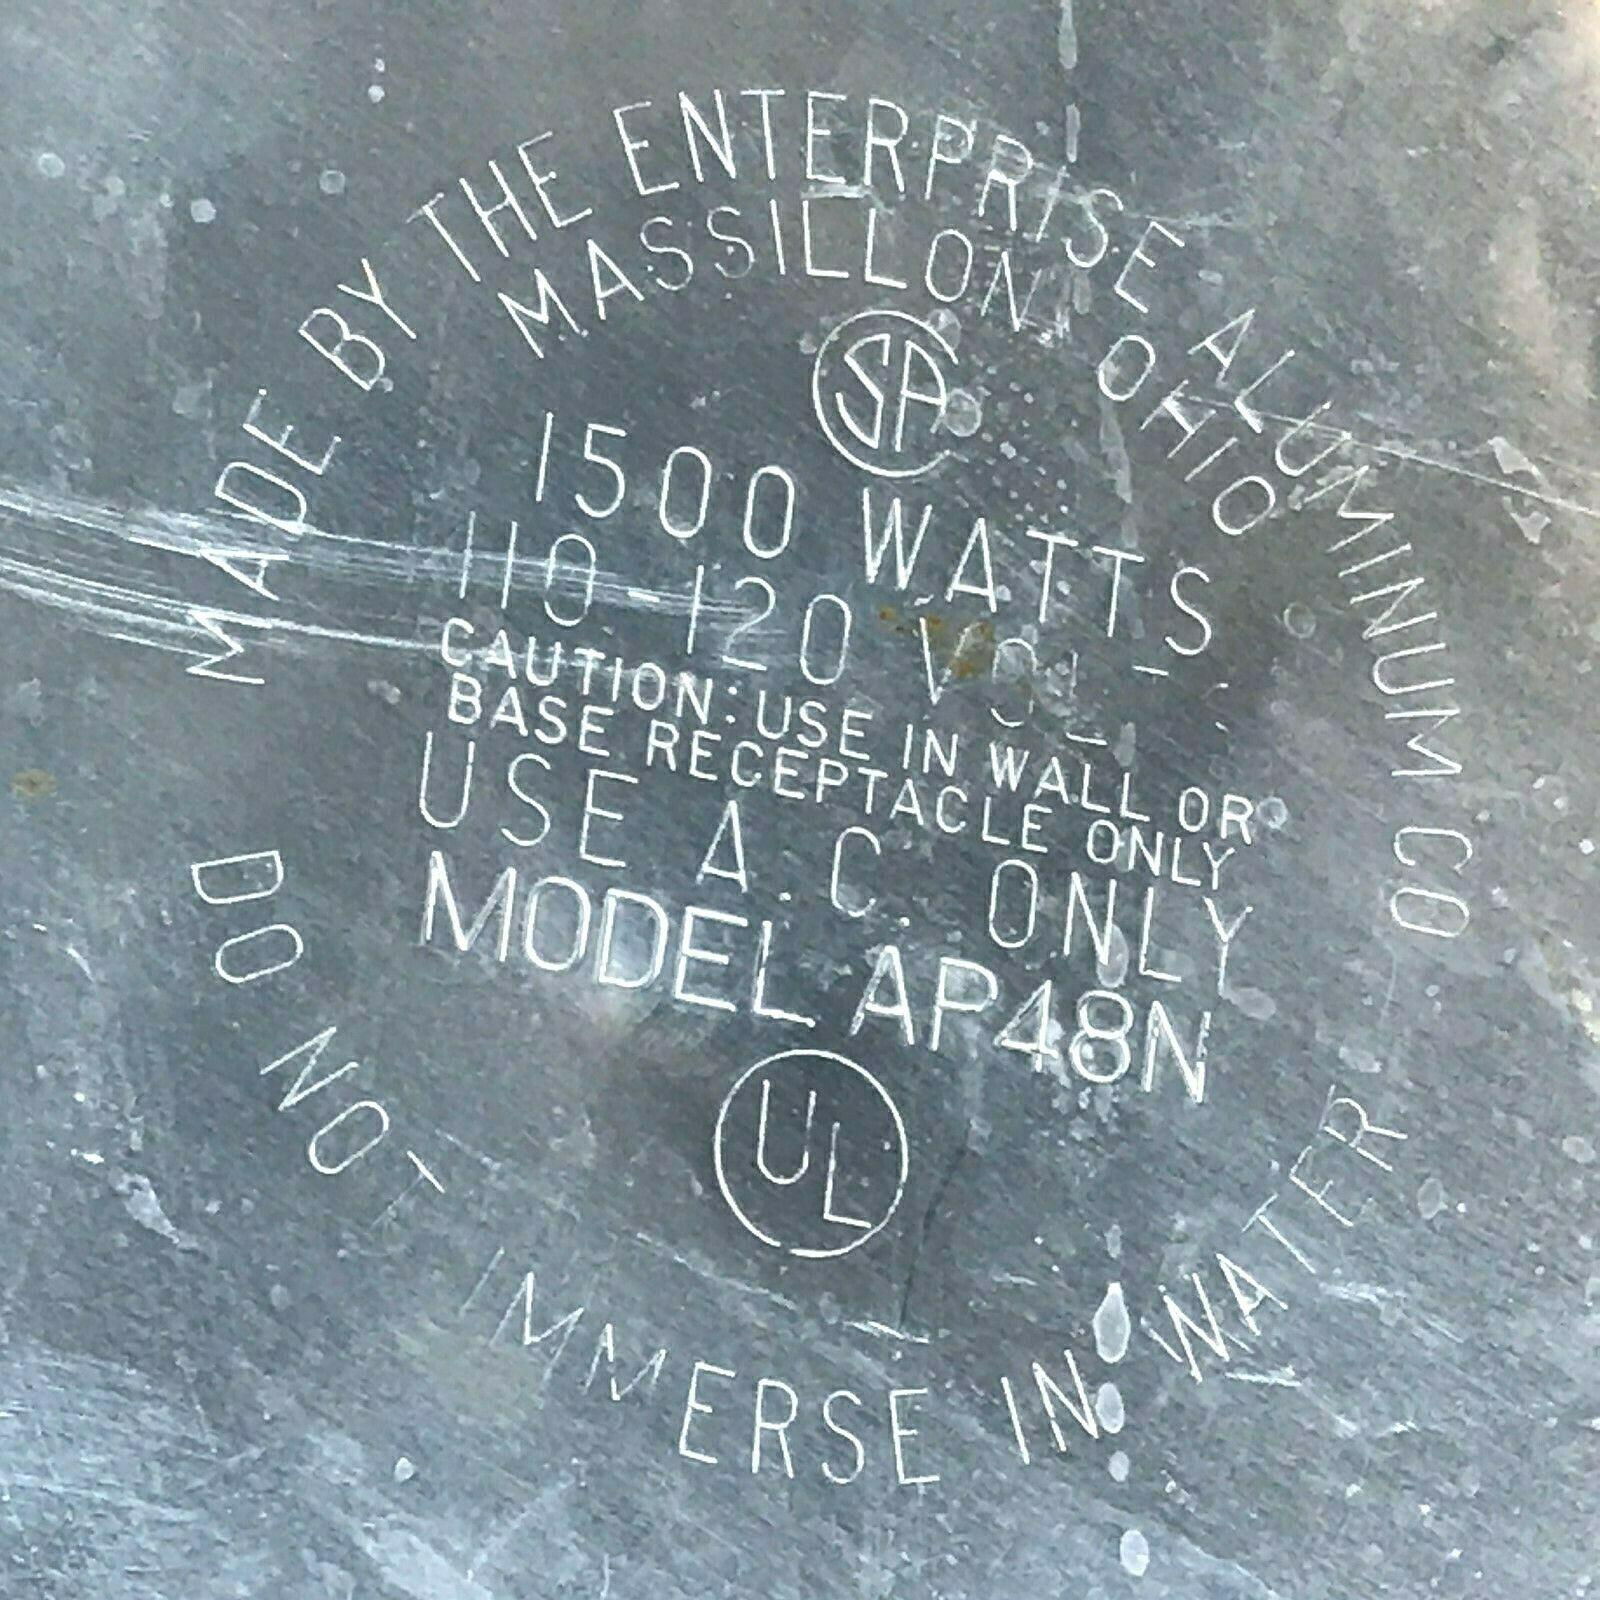 Vintage Enterprise Coffee Percolator 58 cup Urn Model AP48N WORKS Glass Knob LB image 11